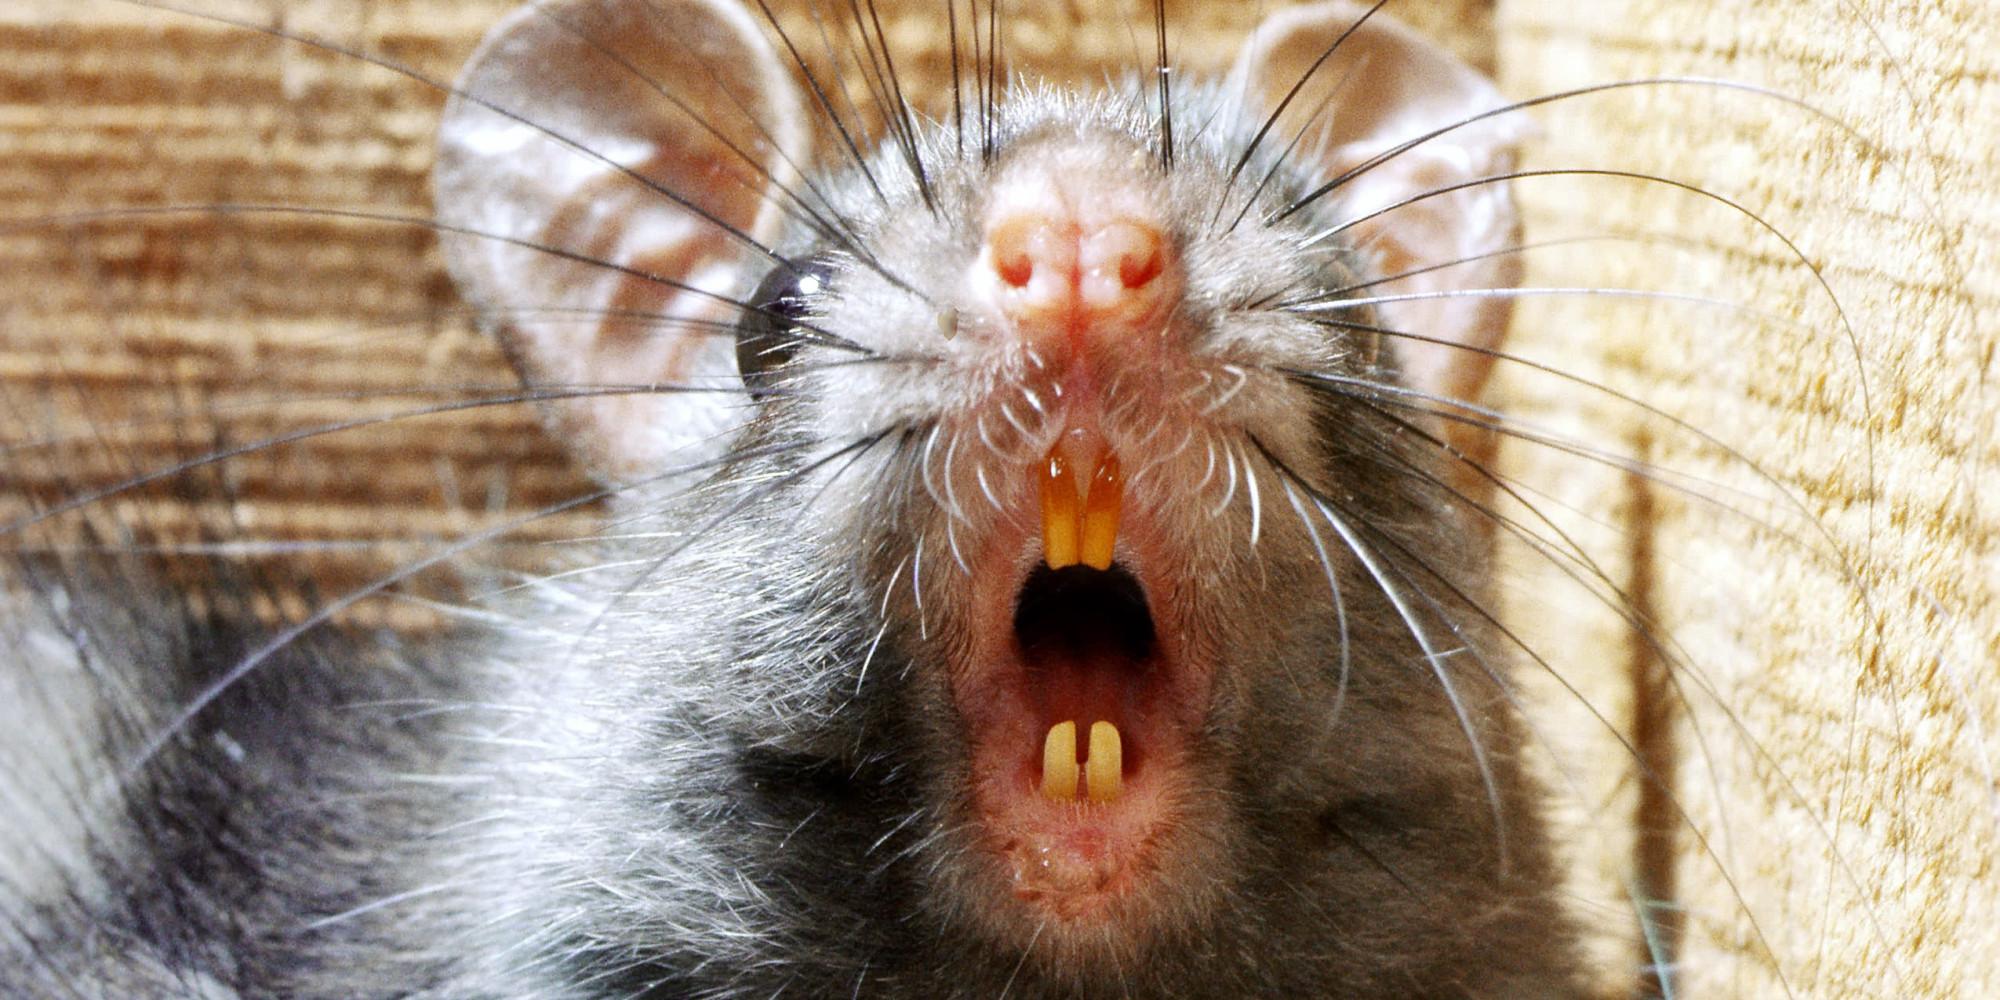 Black rat threatening with teeth bared